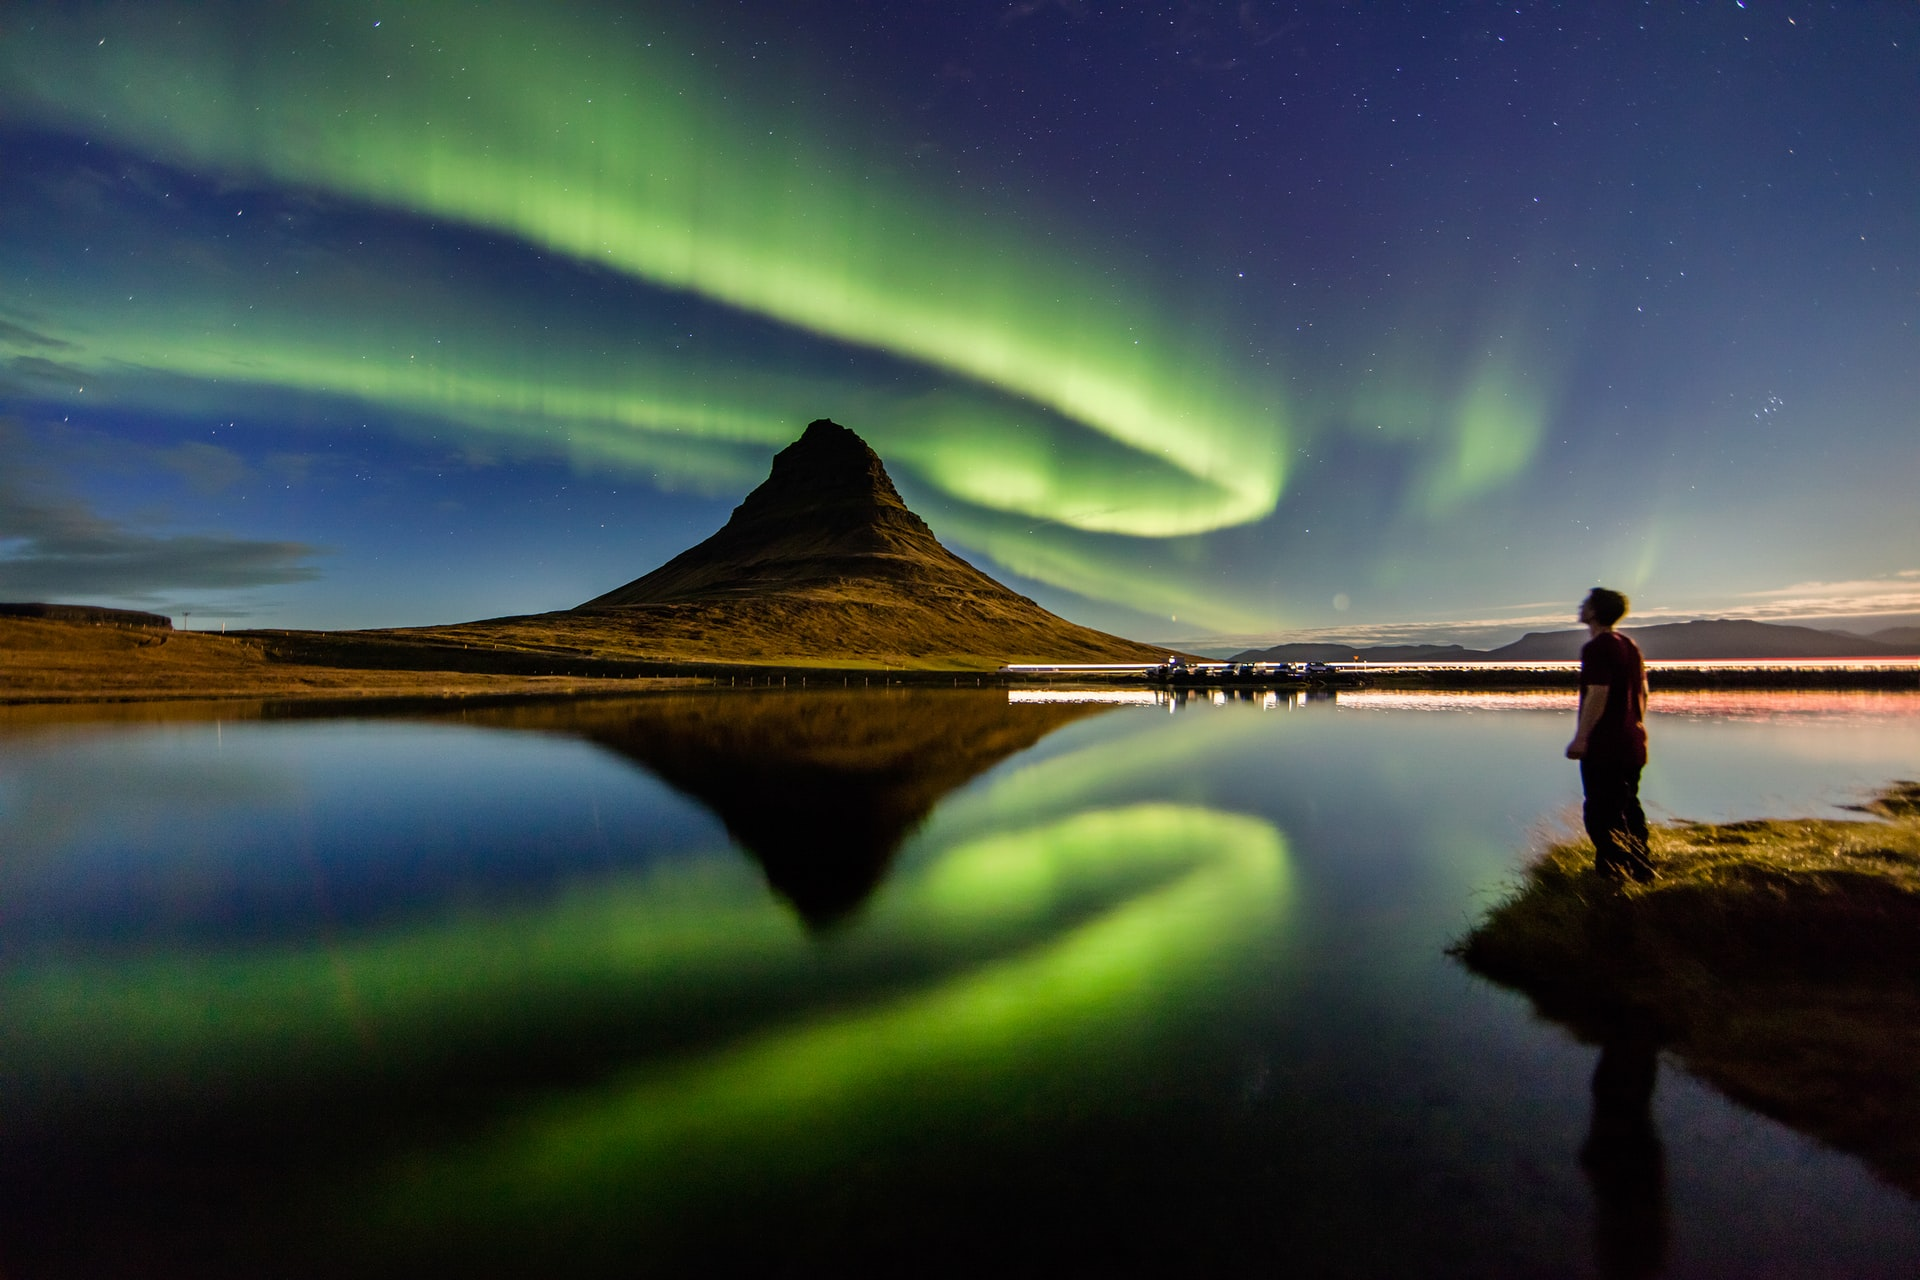 Aurora meeting in Kirkjufell, Iceland by Joshua Earle on Unsplash